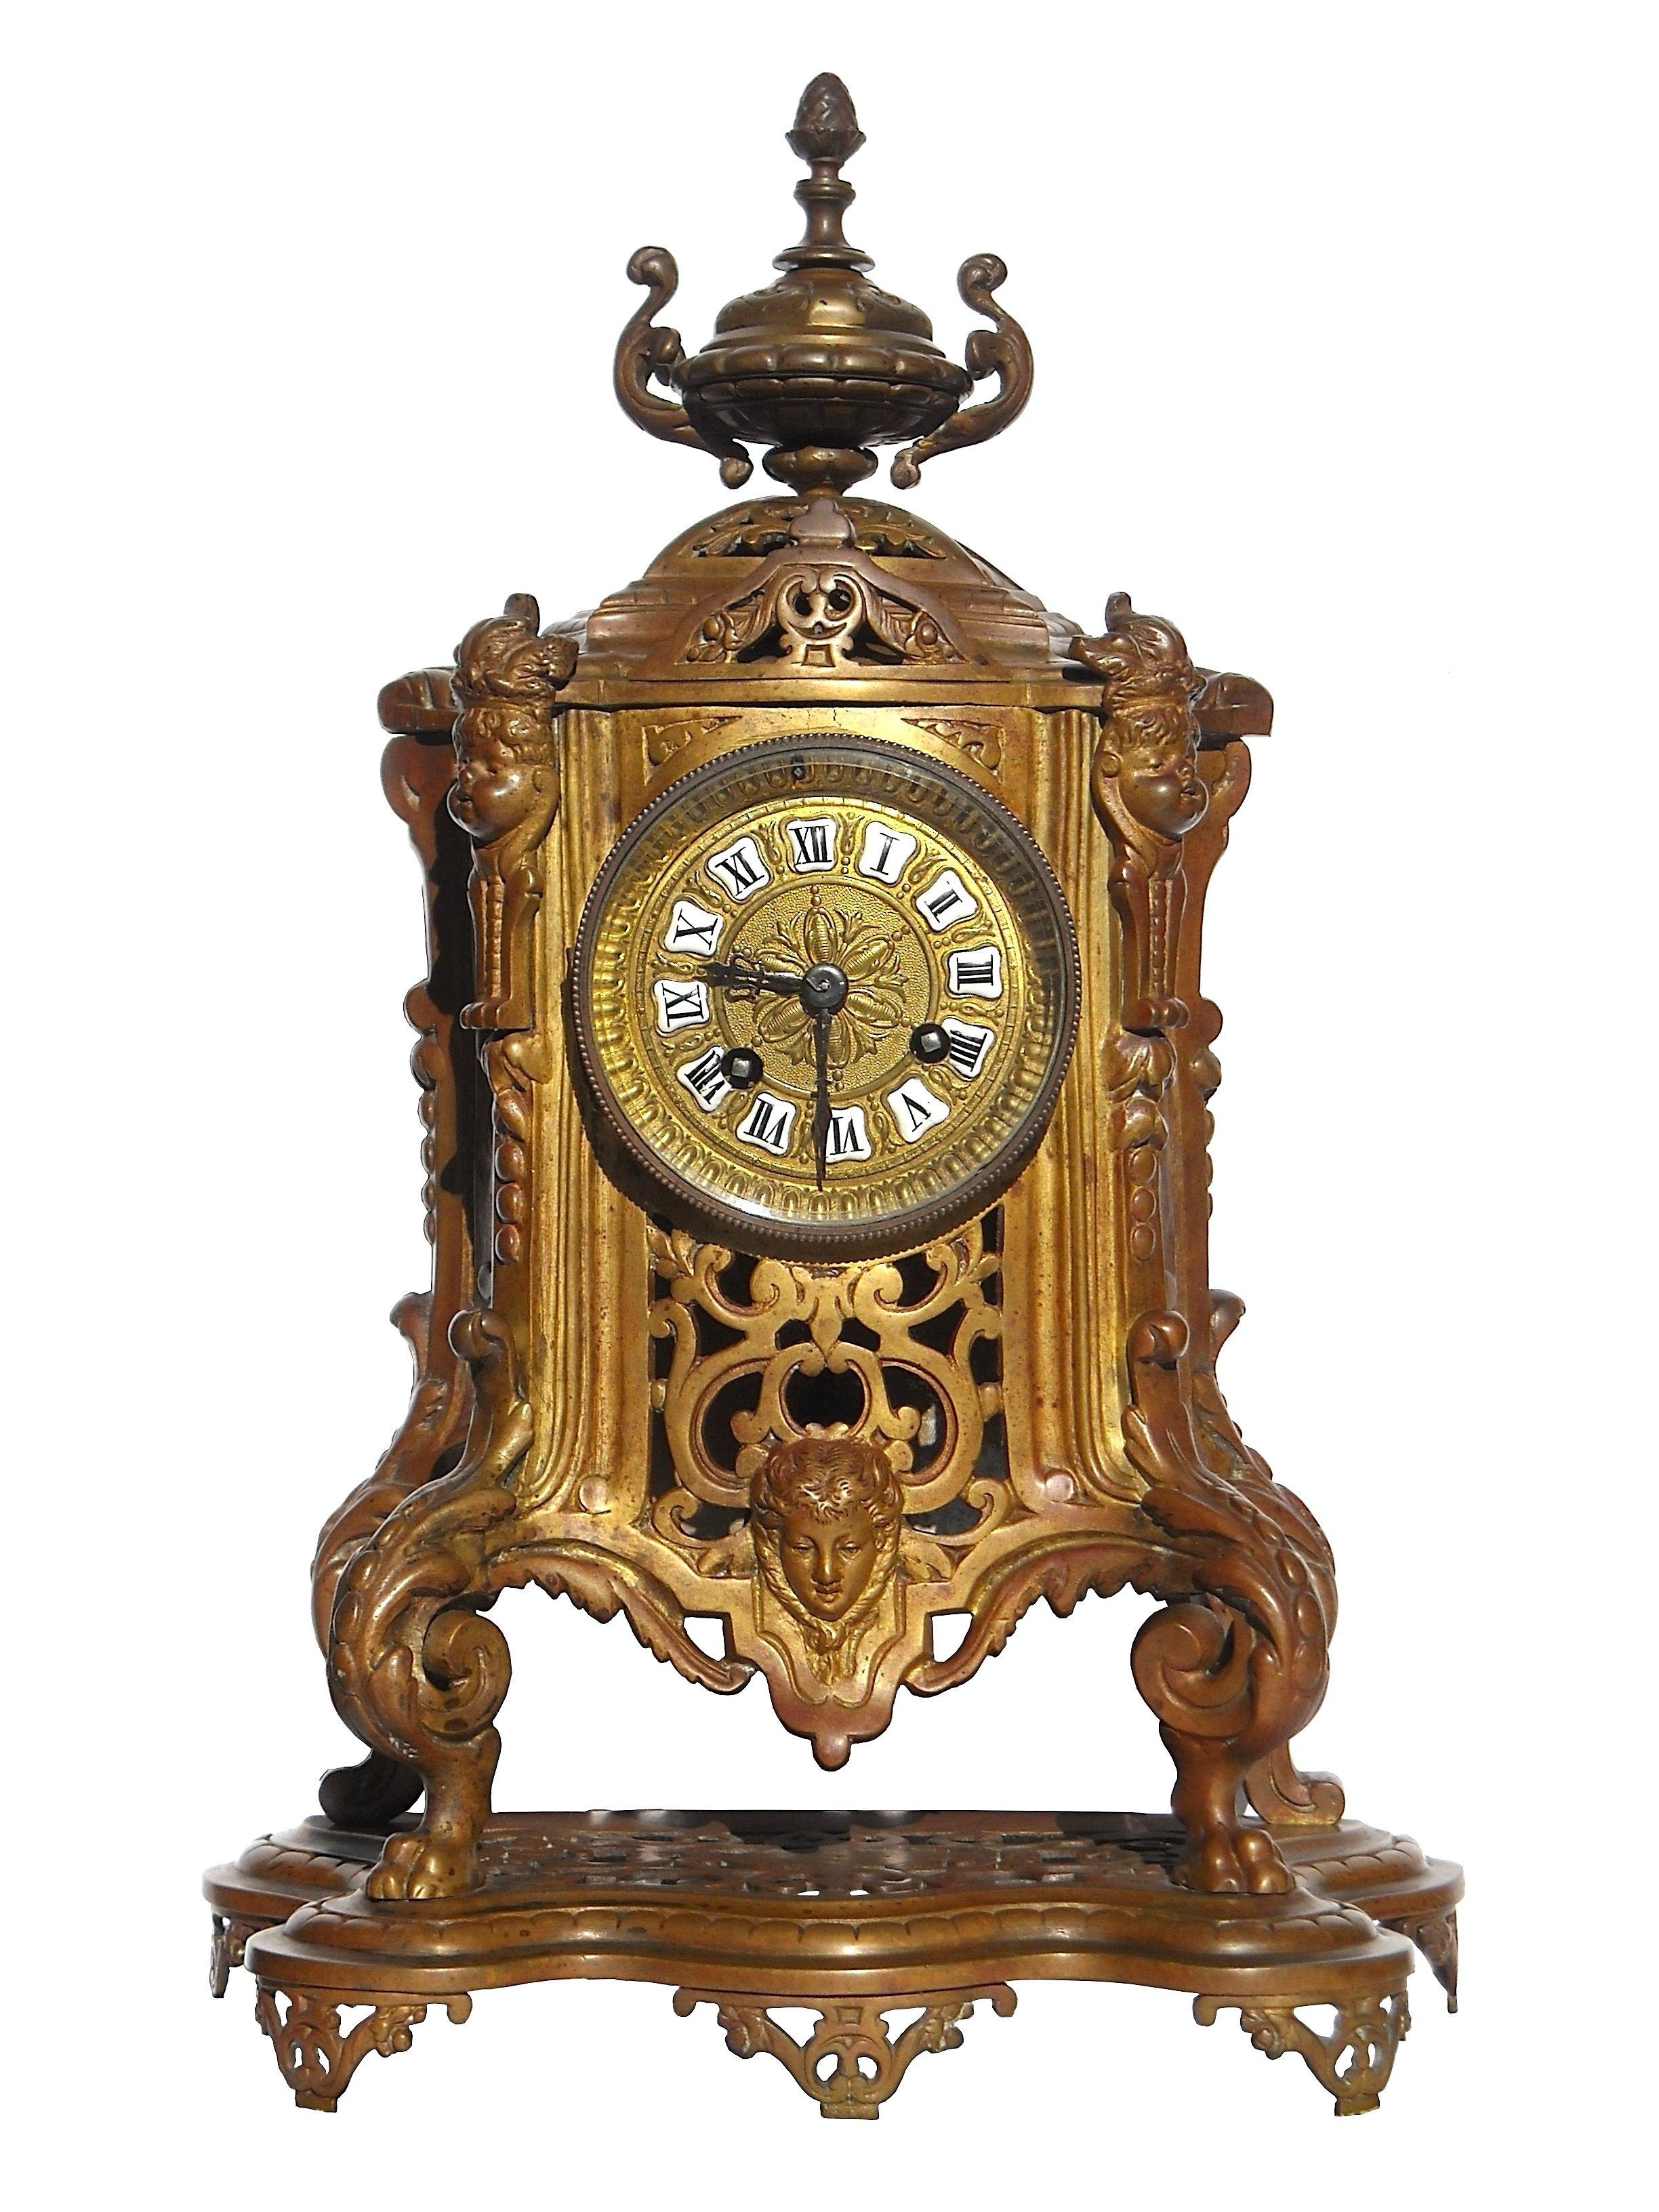 Datazione orologi francesi